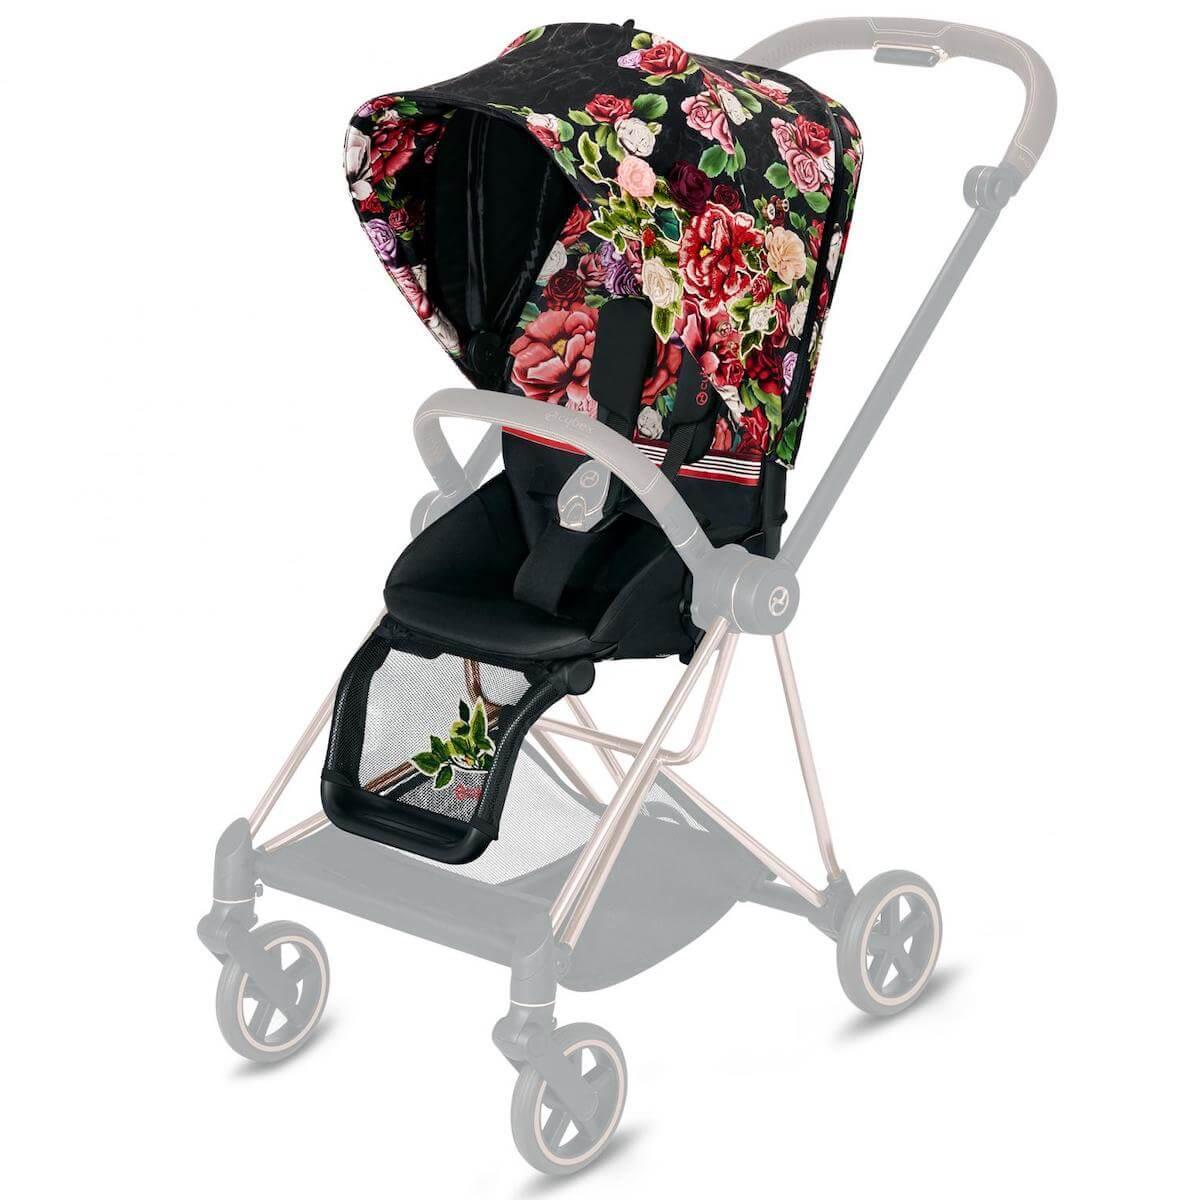 Seat Pack MIOS Cybex Spring Blossom Dark-black